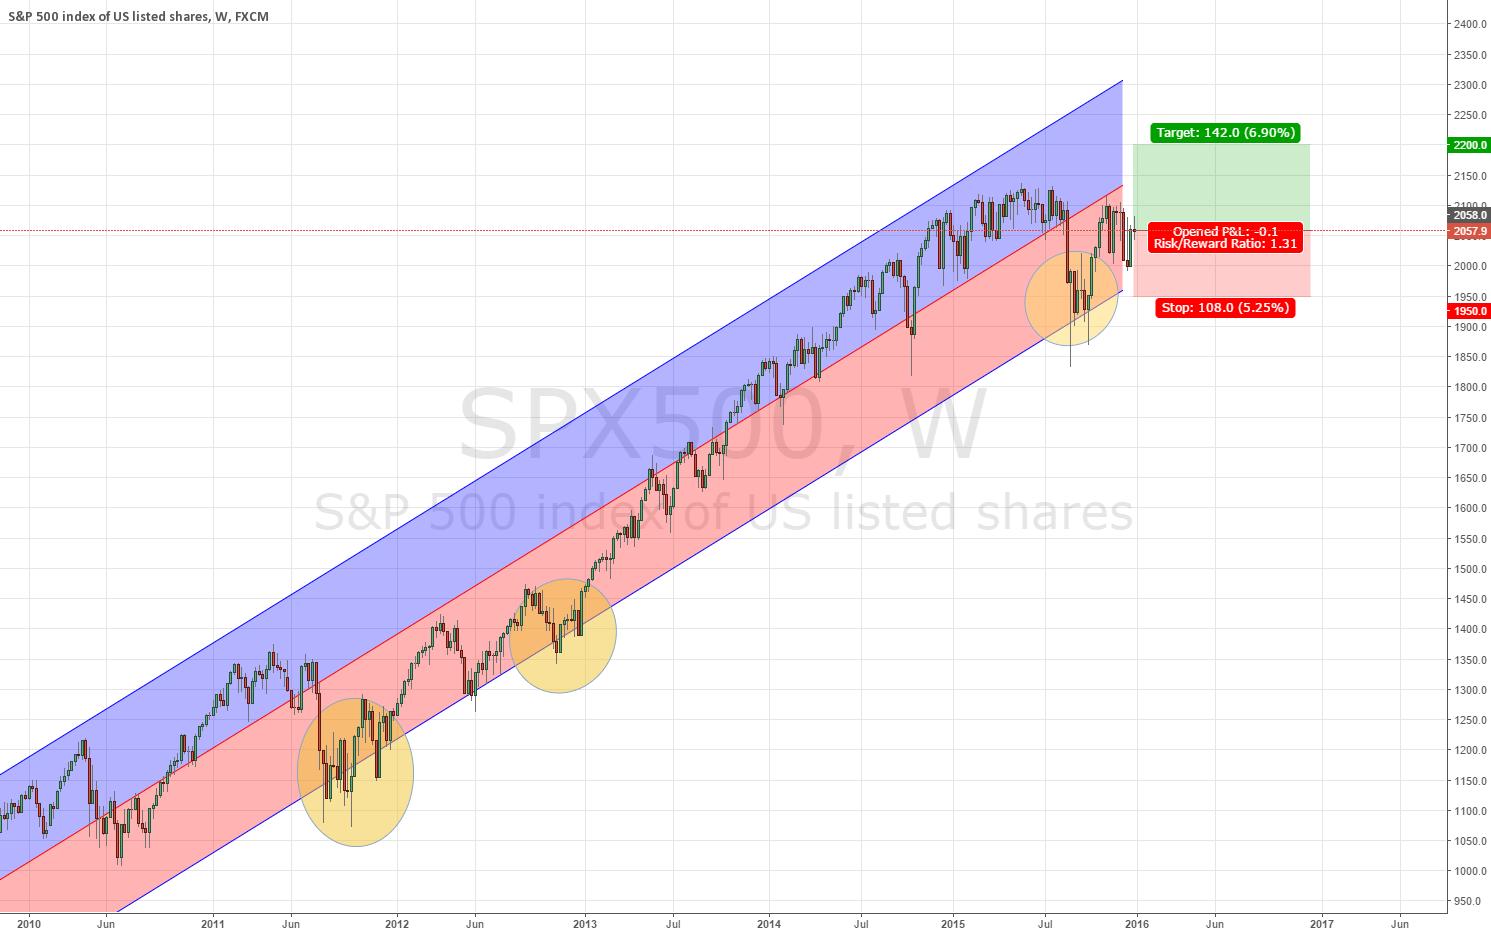 SP500 outlook